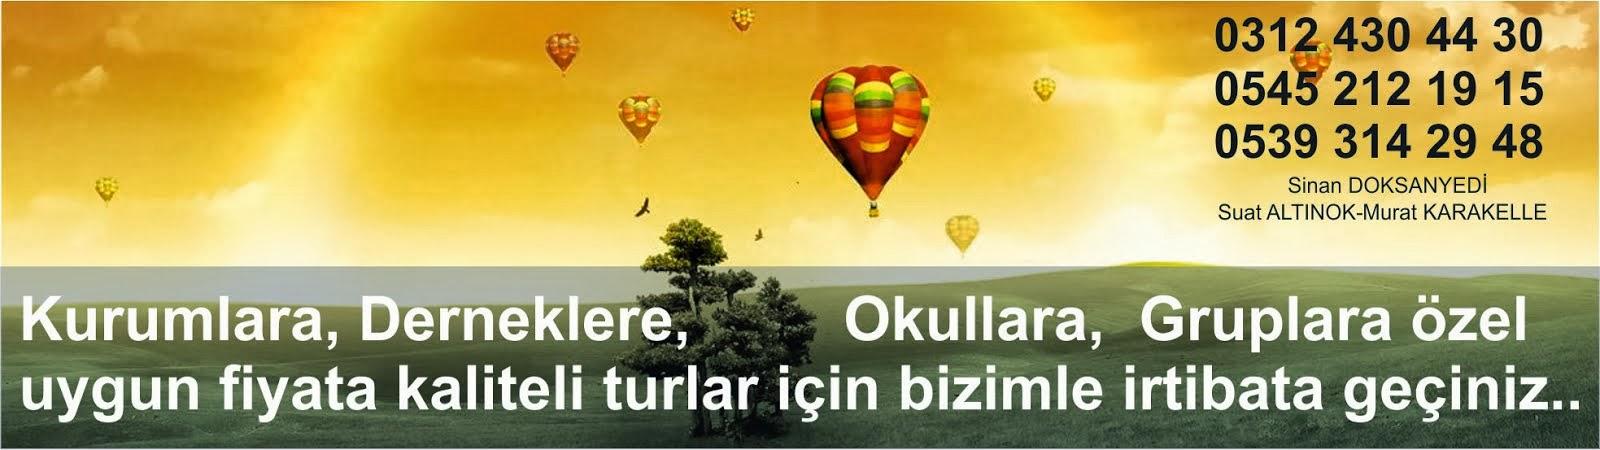 Bursa Turu,  Ankara çıkışlı bursa turu, Ankaradan Bursa Turu